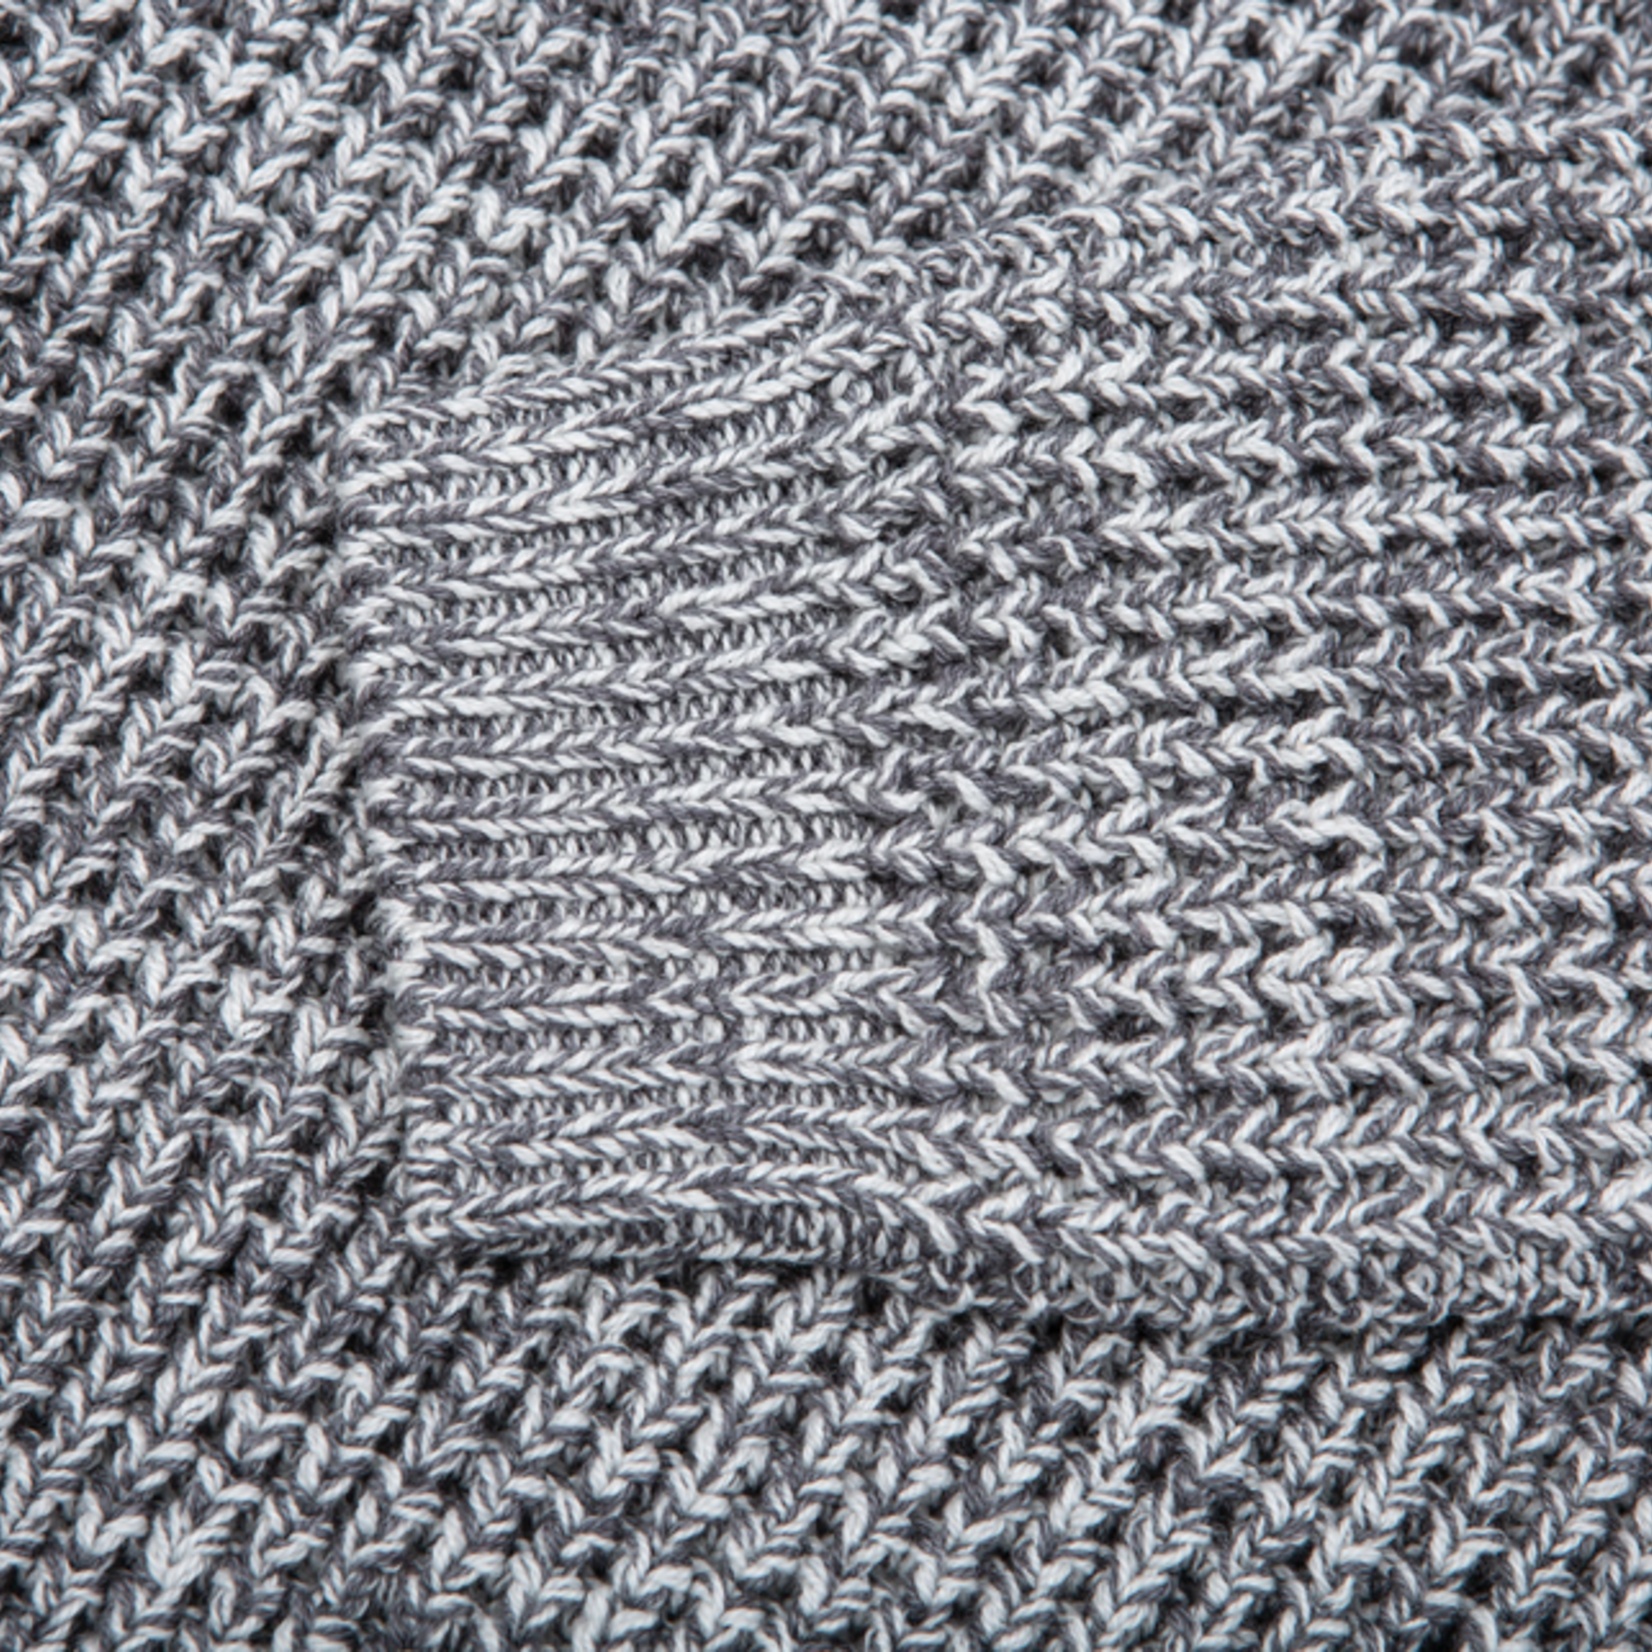 Onward Reserve Longleaf Sweater Mirage Grey